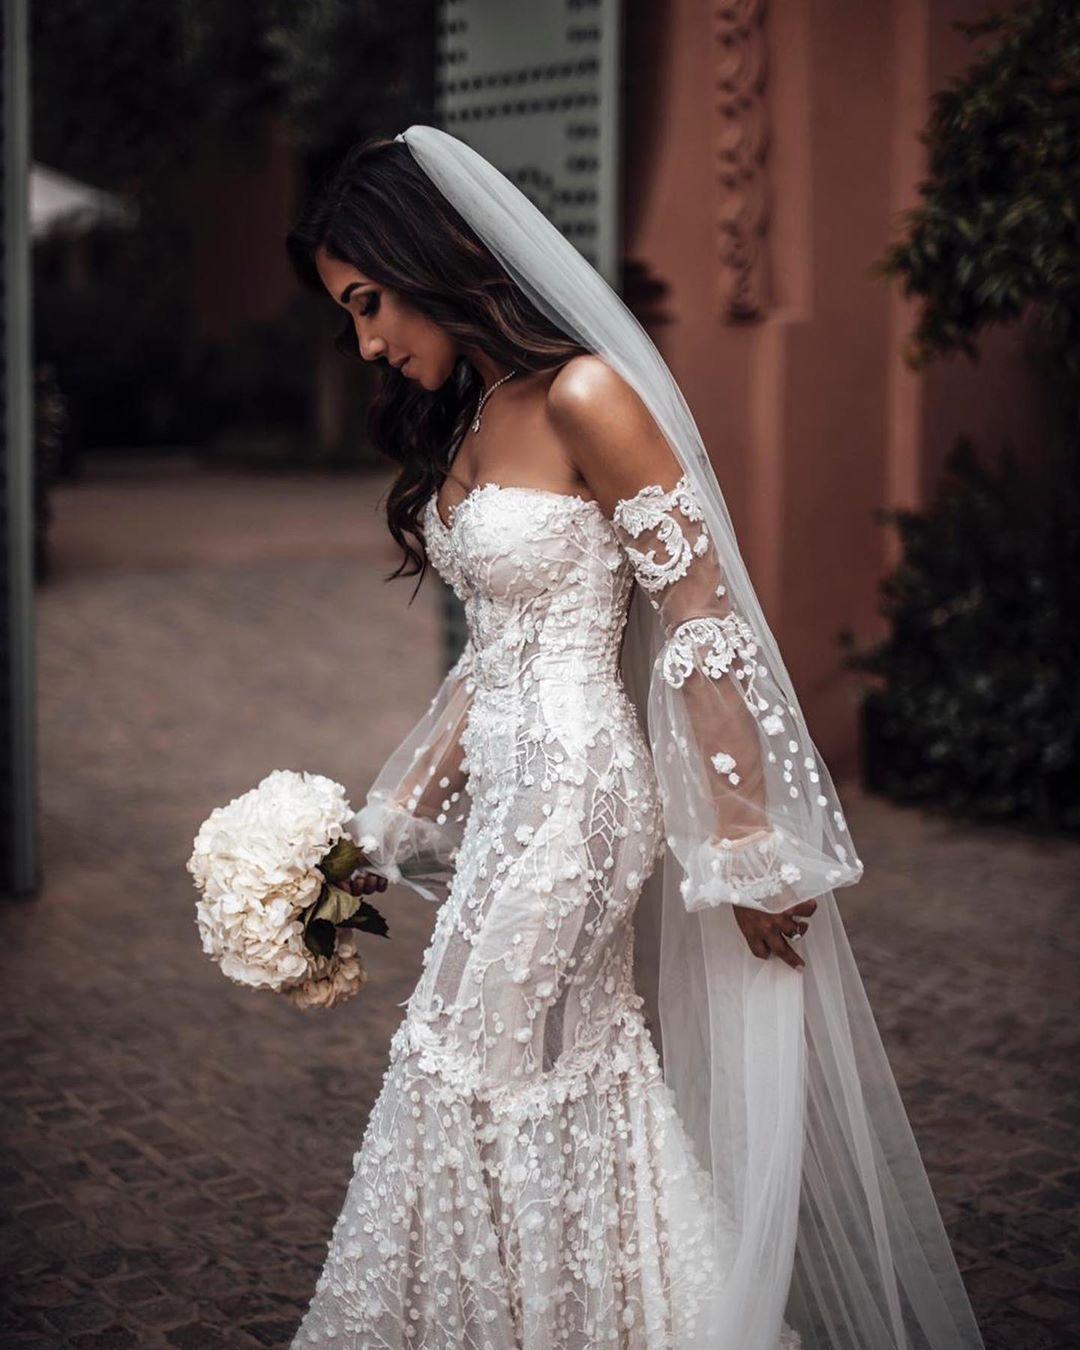 Camilla Alegria Bridal Dresses Galia Lahav Wedding Dress Long Sleeve Wedding Dresses Bridal Dresses